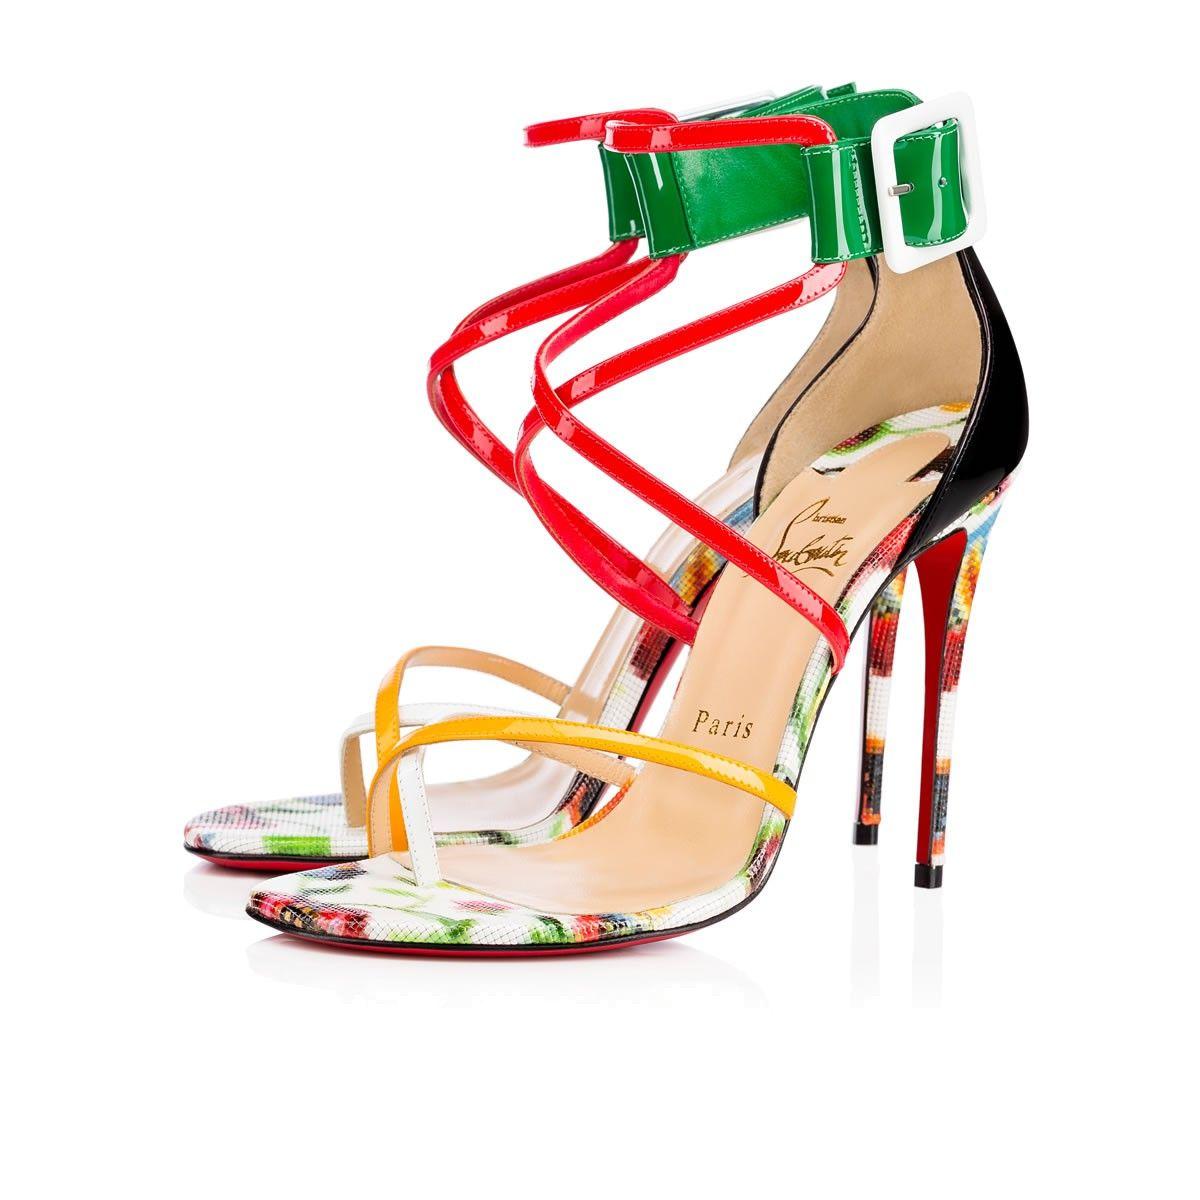 82e1f264c166 CHRISTIAN LOUBOUTIN Antigua Bay 100 Multicolor Patent Leather - Women Shoes  - Christian Louboutin.  christianlouboutin  shoes